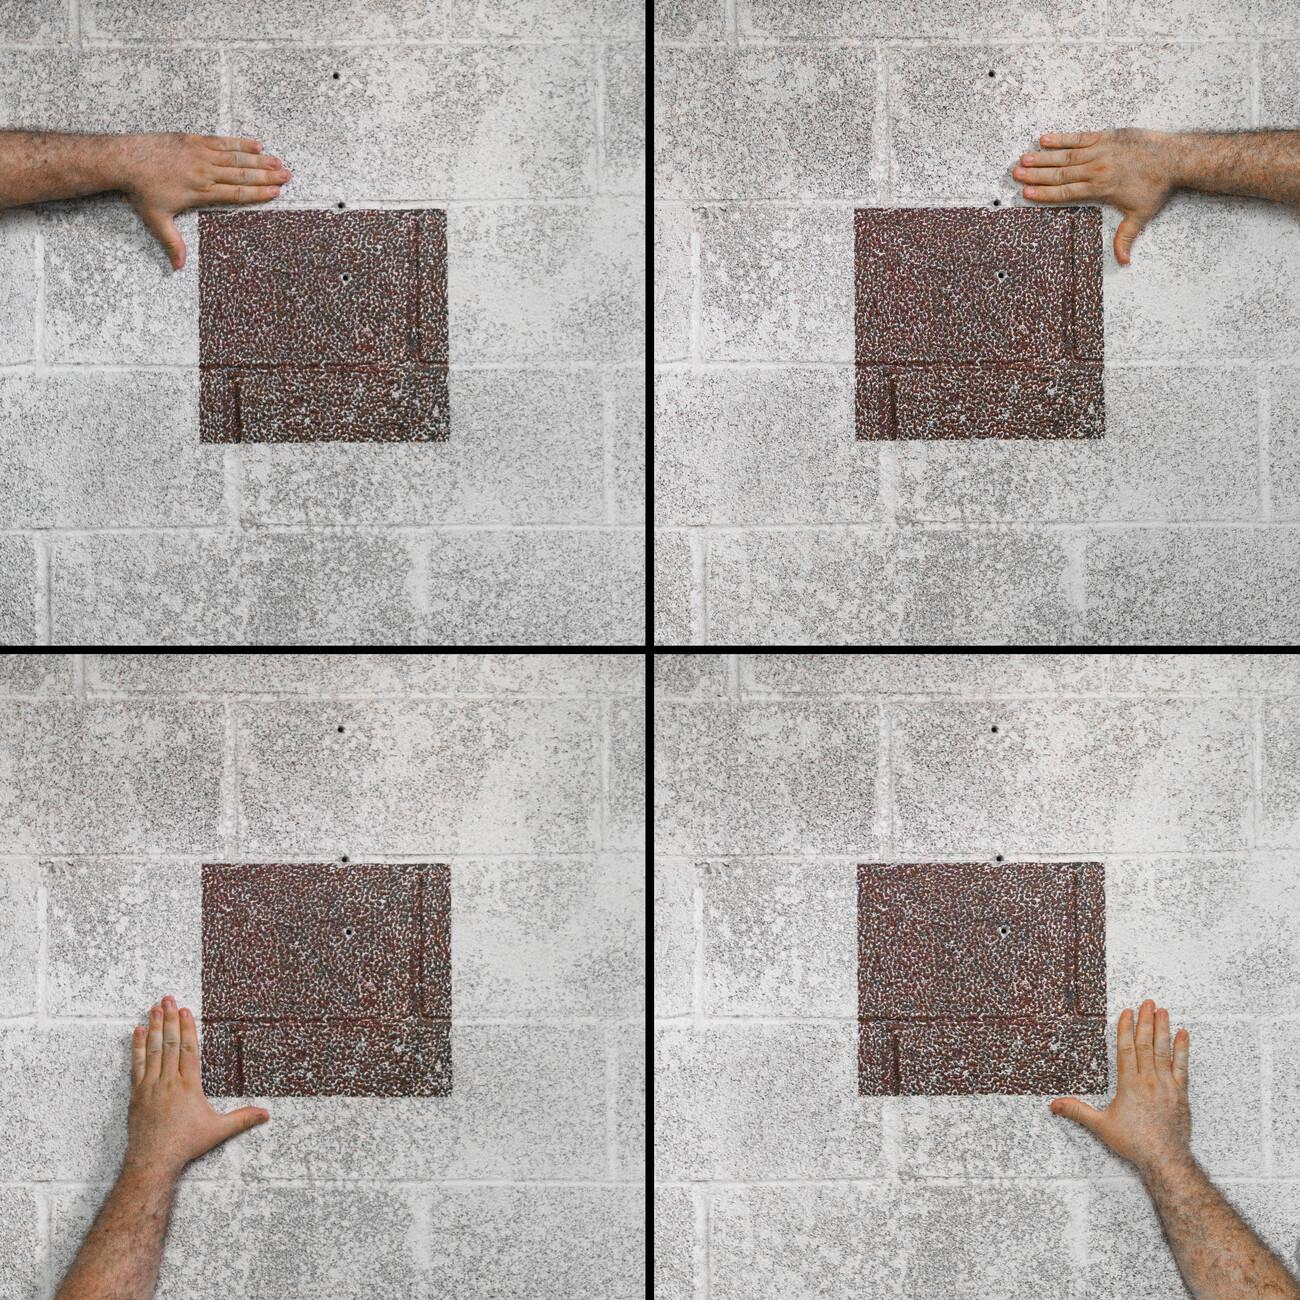 Steve Giasson. Performance invisible n° 161 (Caresser une œuvre d'art). Sol LeWitt. Crayola Square. 1999. Performeur : Steve Giasson. Crédit photographique : Martin Vinette. MoMA PS1, New York. 10 juillet 2017.